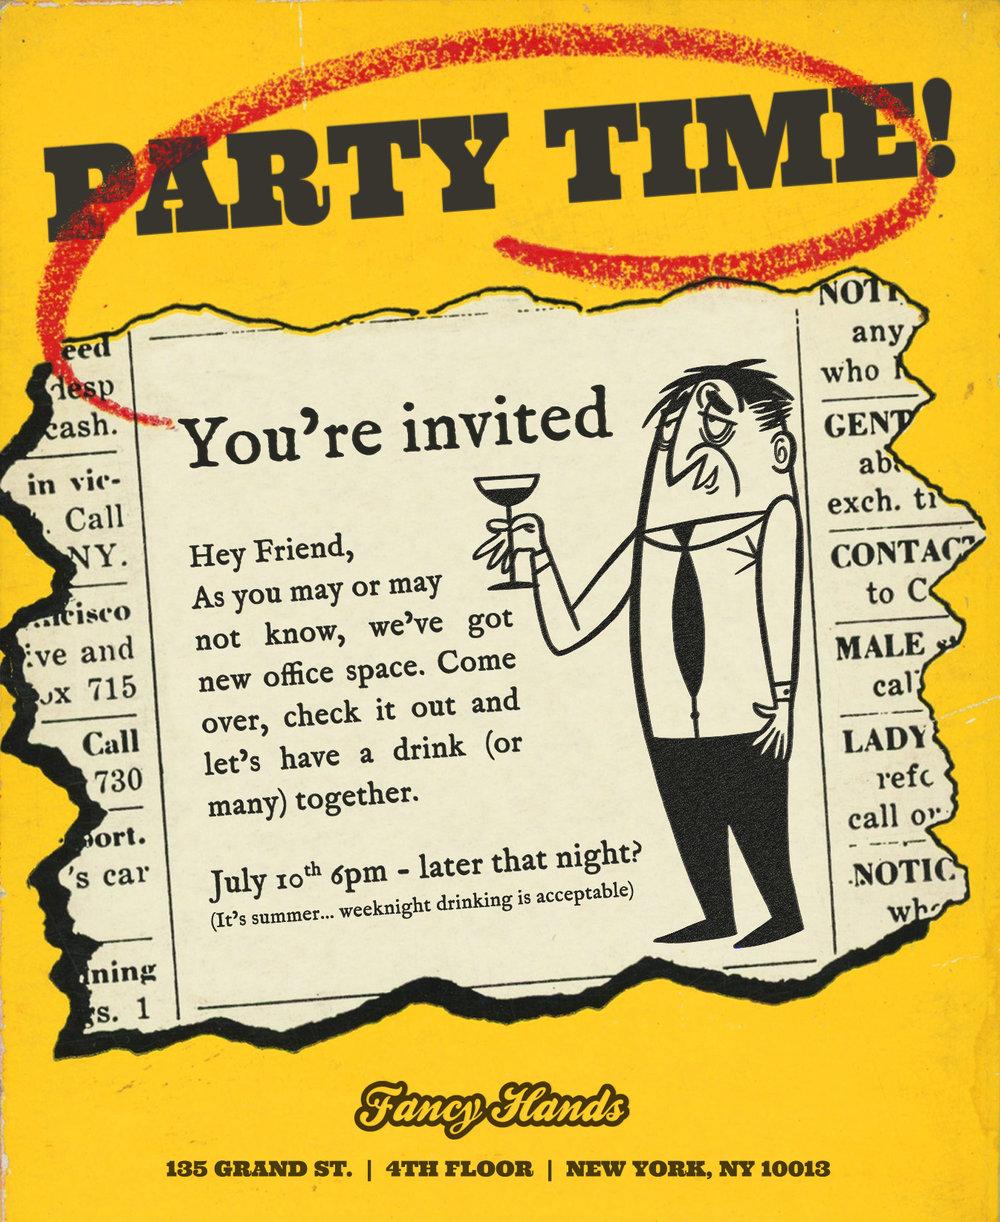 FH-Invite.jpg